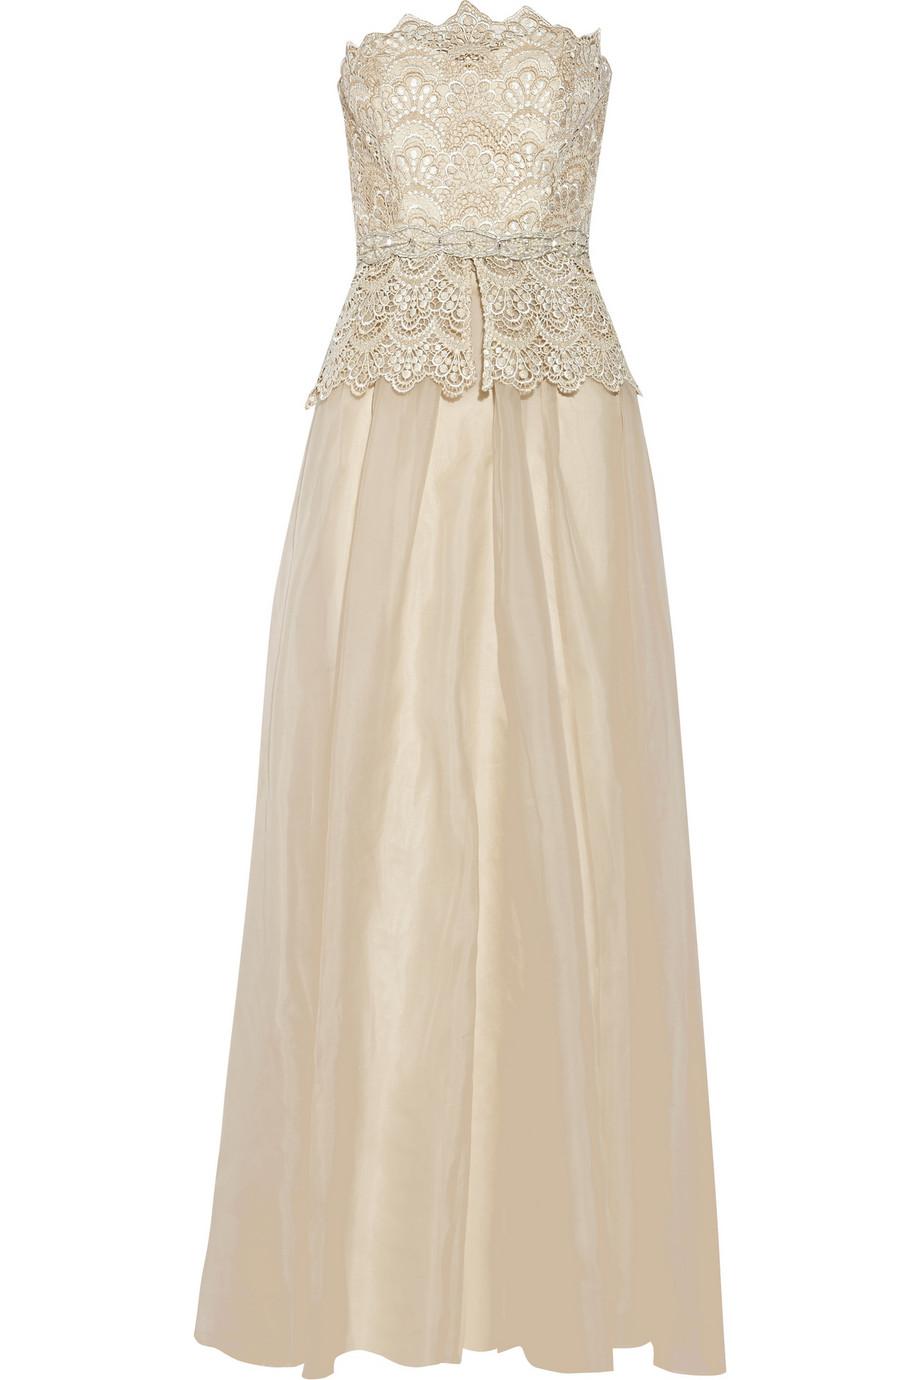 بالصور فصالات فساتين , اسهل تفصيلات الفساتين 3782 9